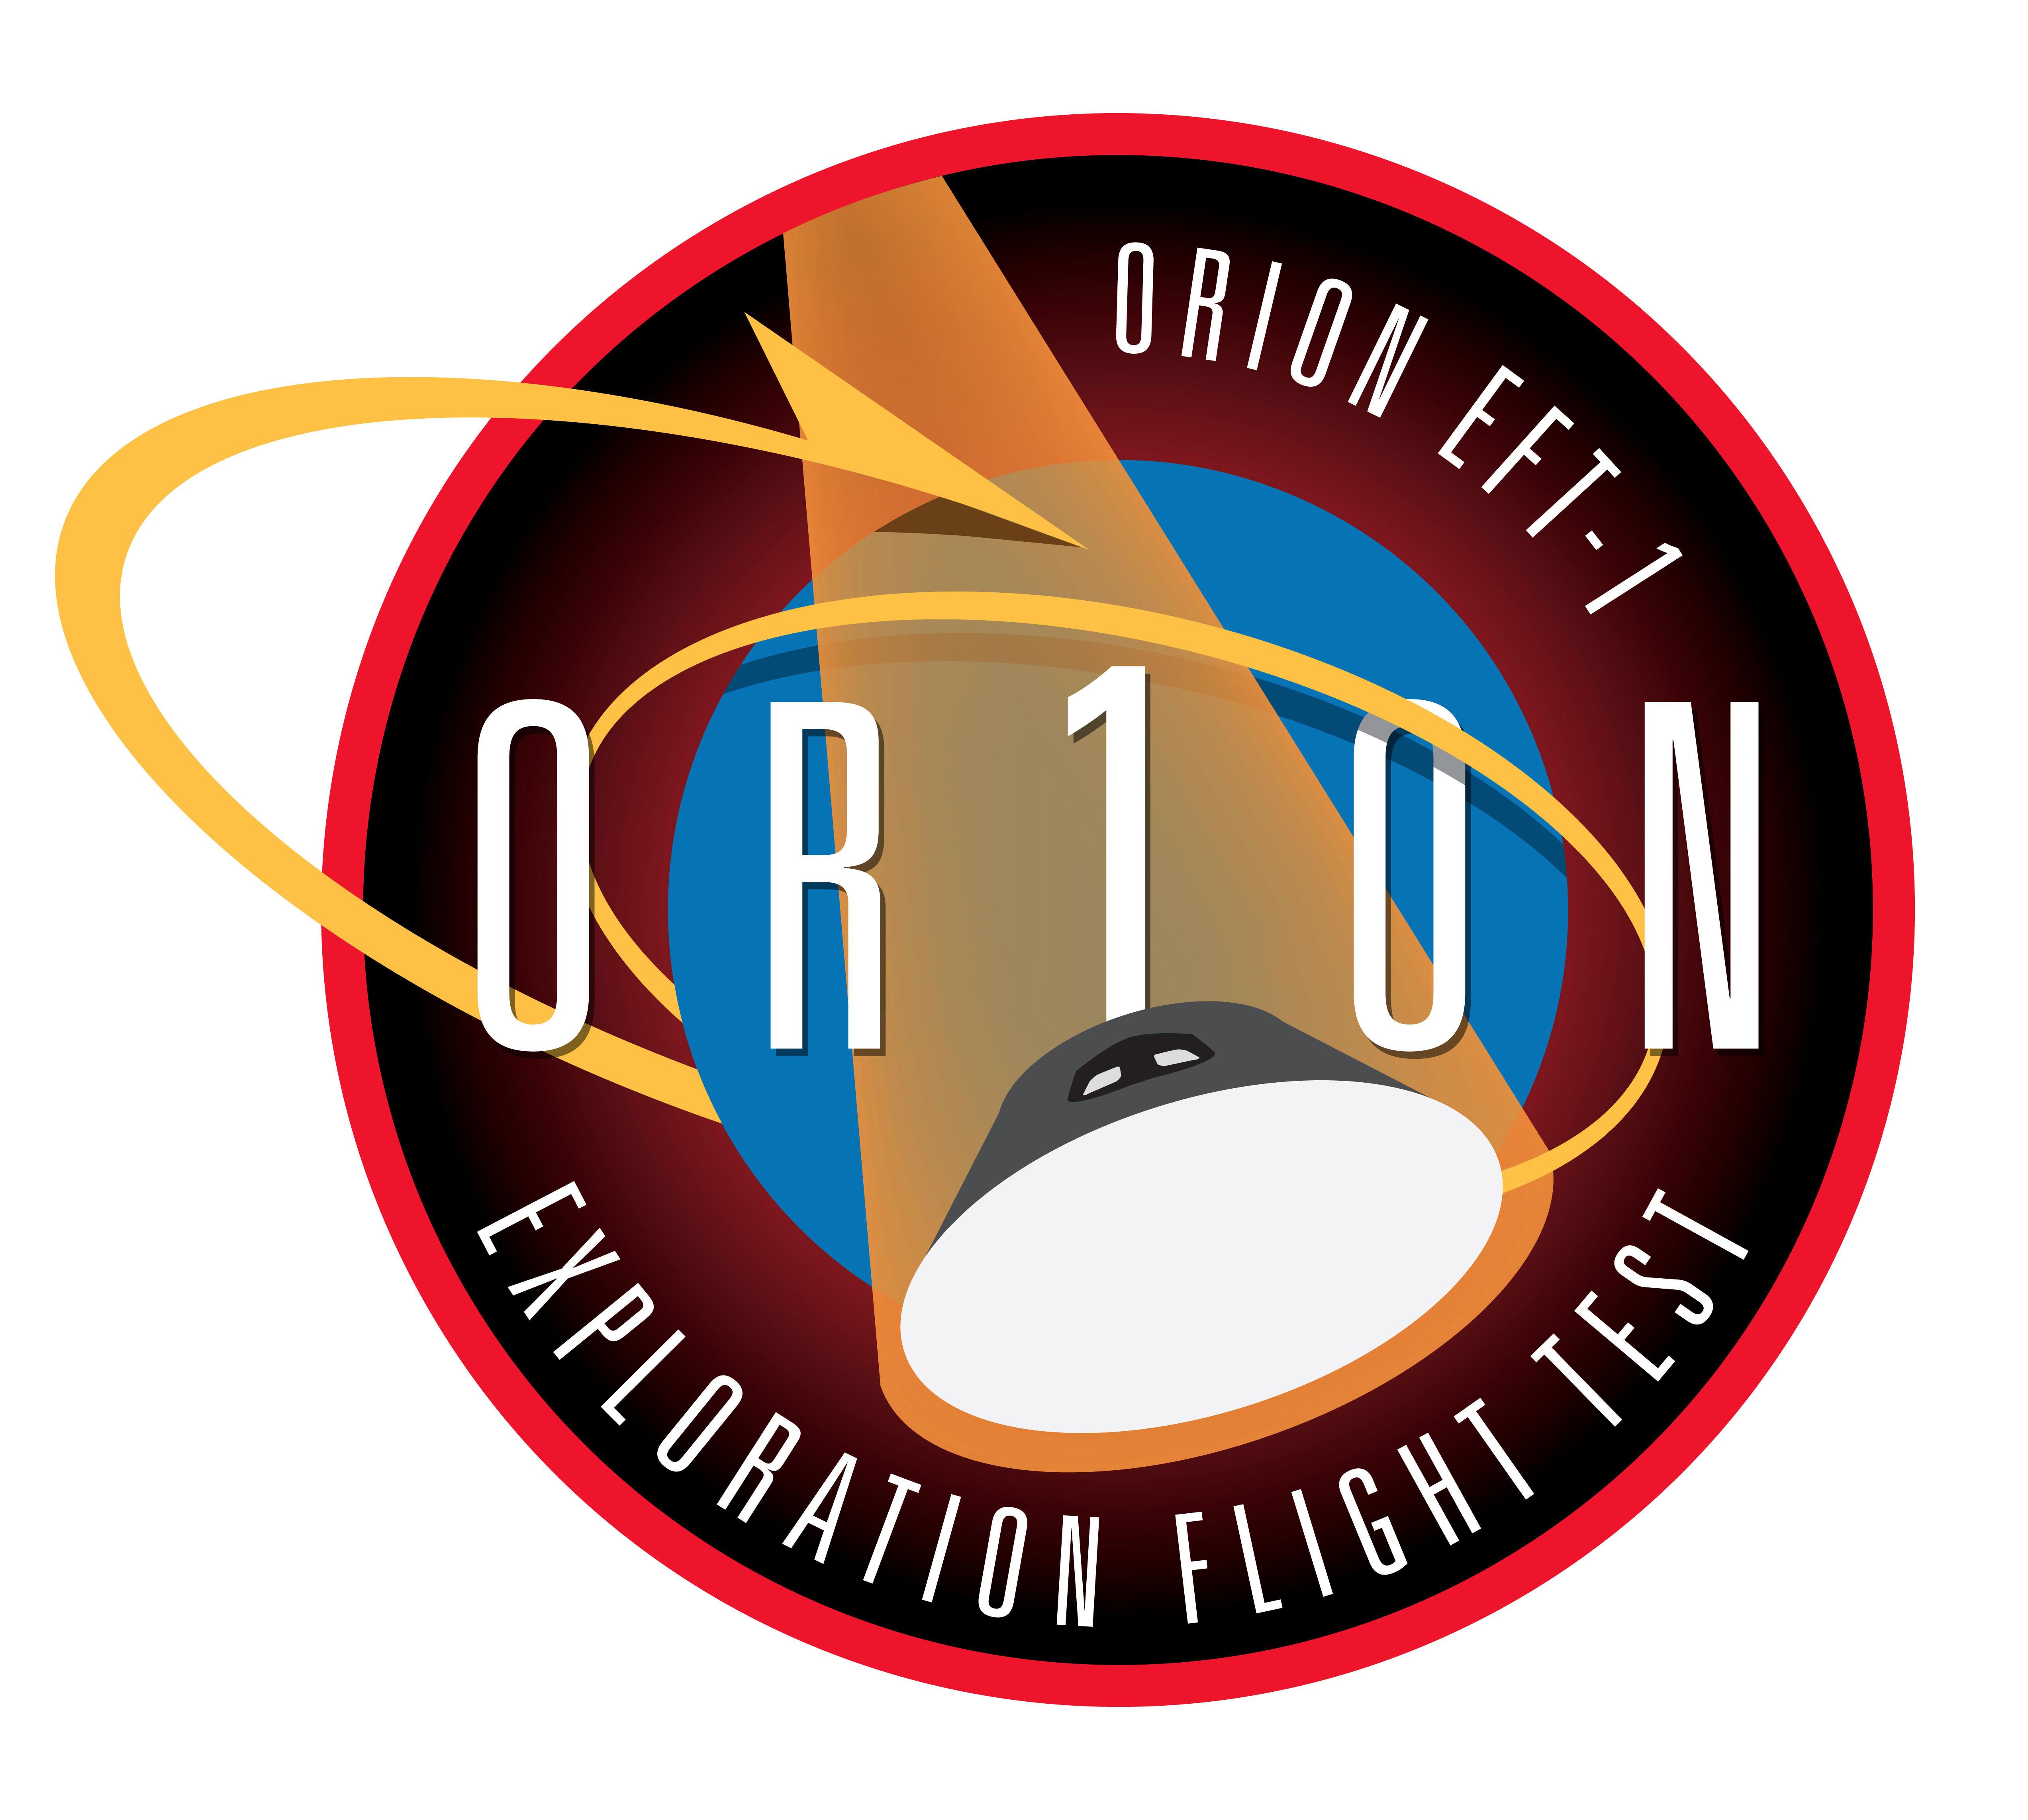 orion spacecraft logo - photo #6